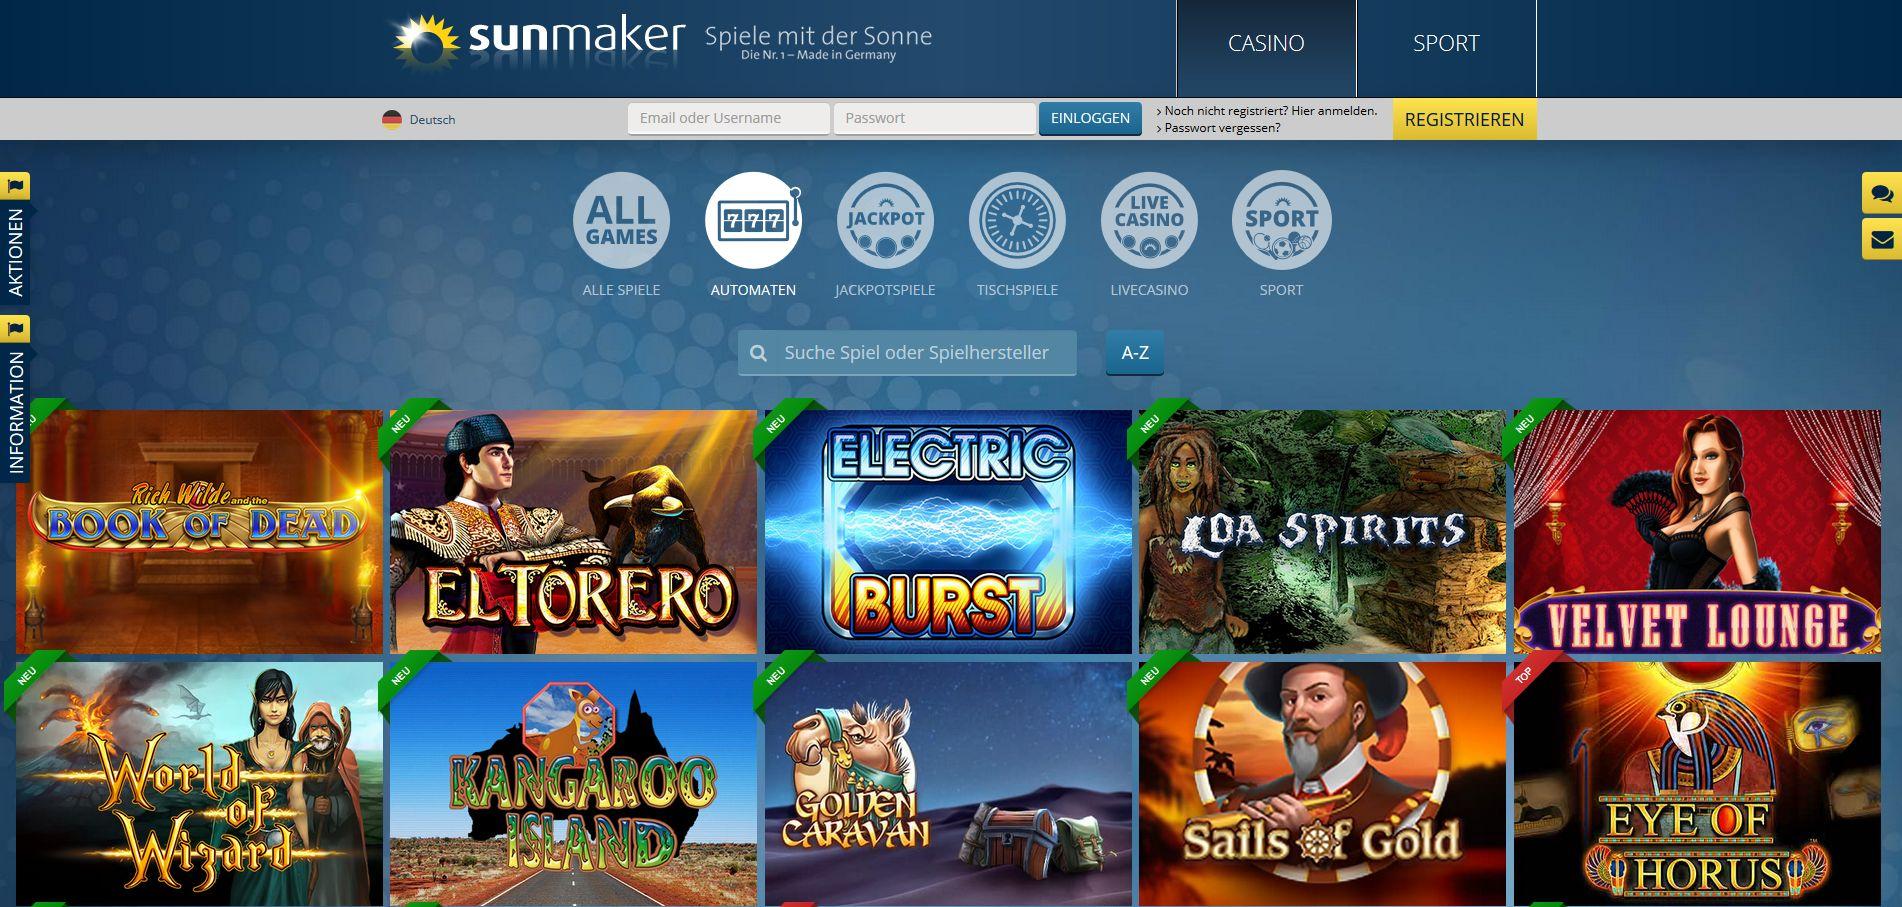 Https://Mobile.Sunmaker.Com/De/Online-Casino-Spiele/